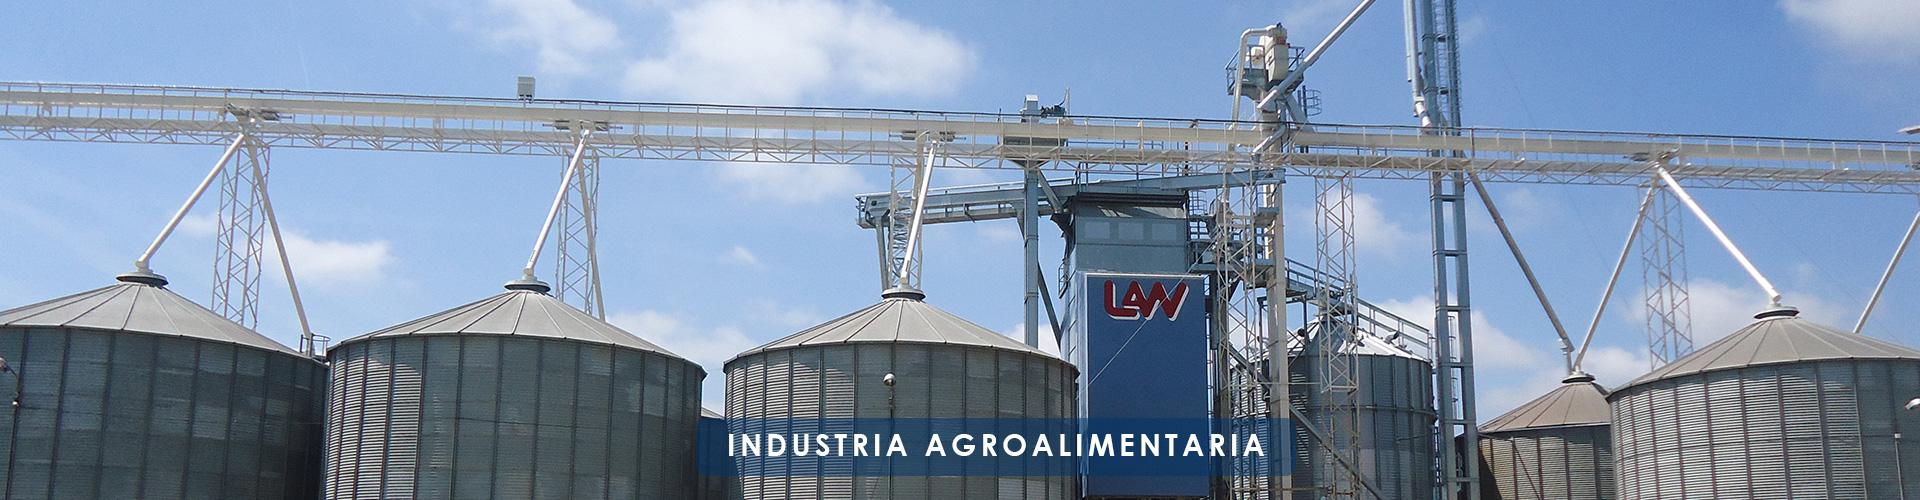 Industria Agroalimentaria